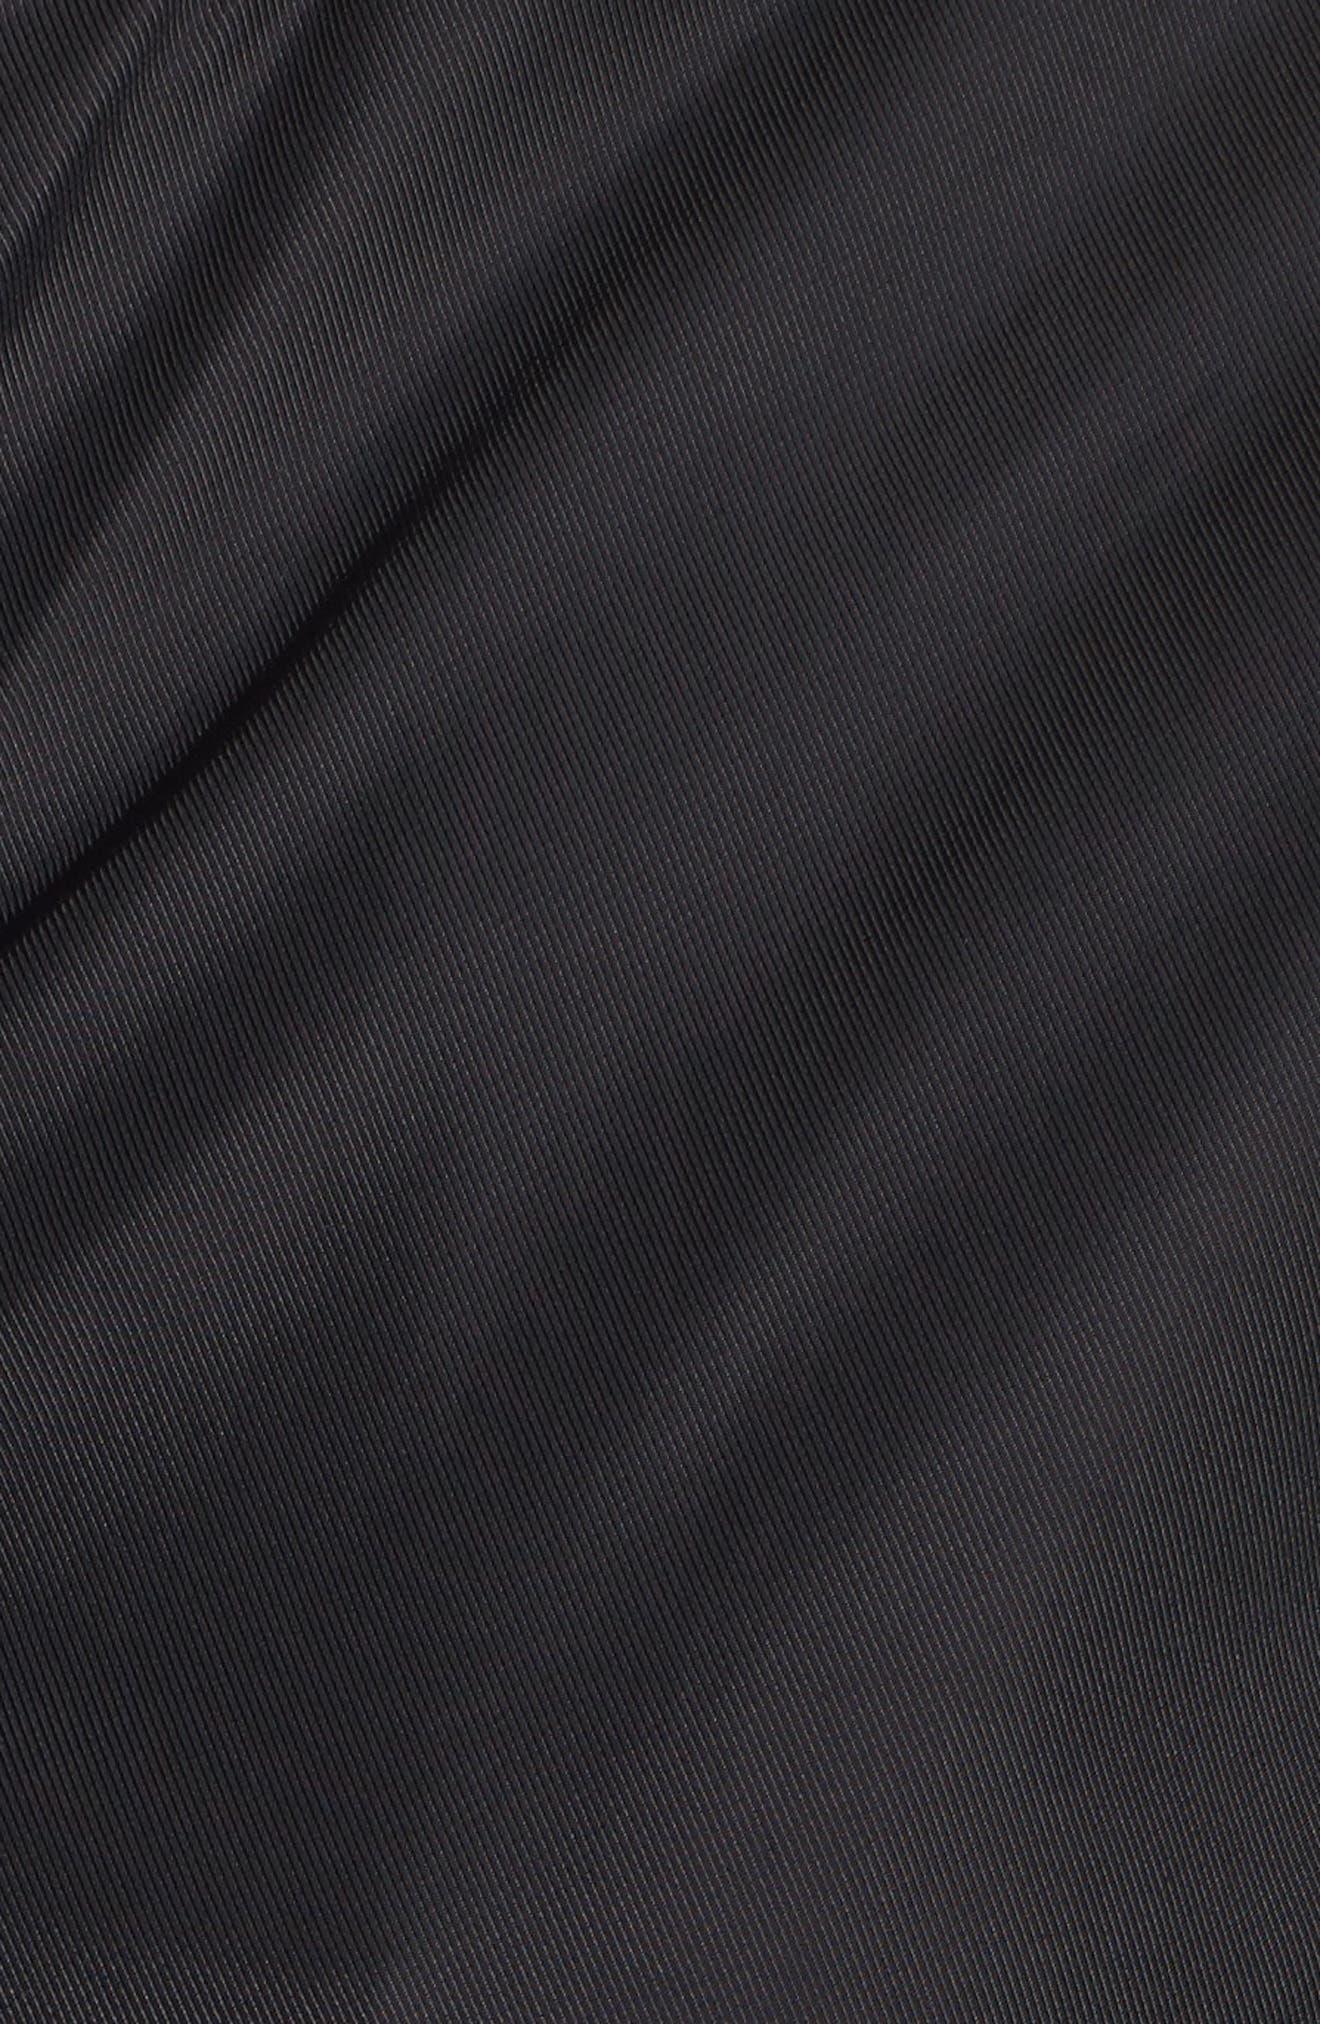 Bomber Anorak Jacket,                             Alternate thumbnail 6, color,